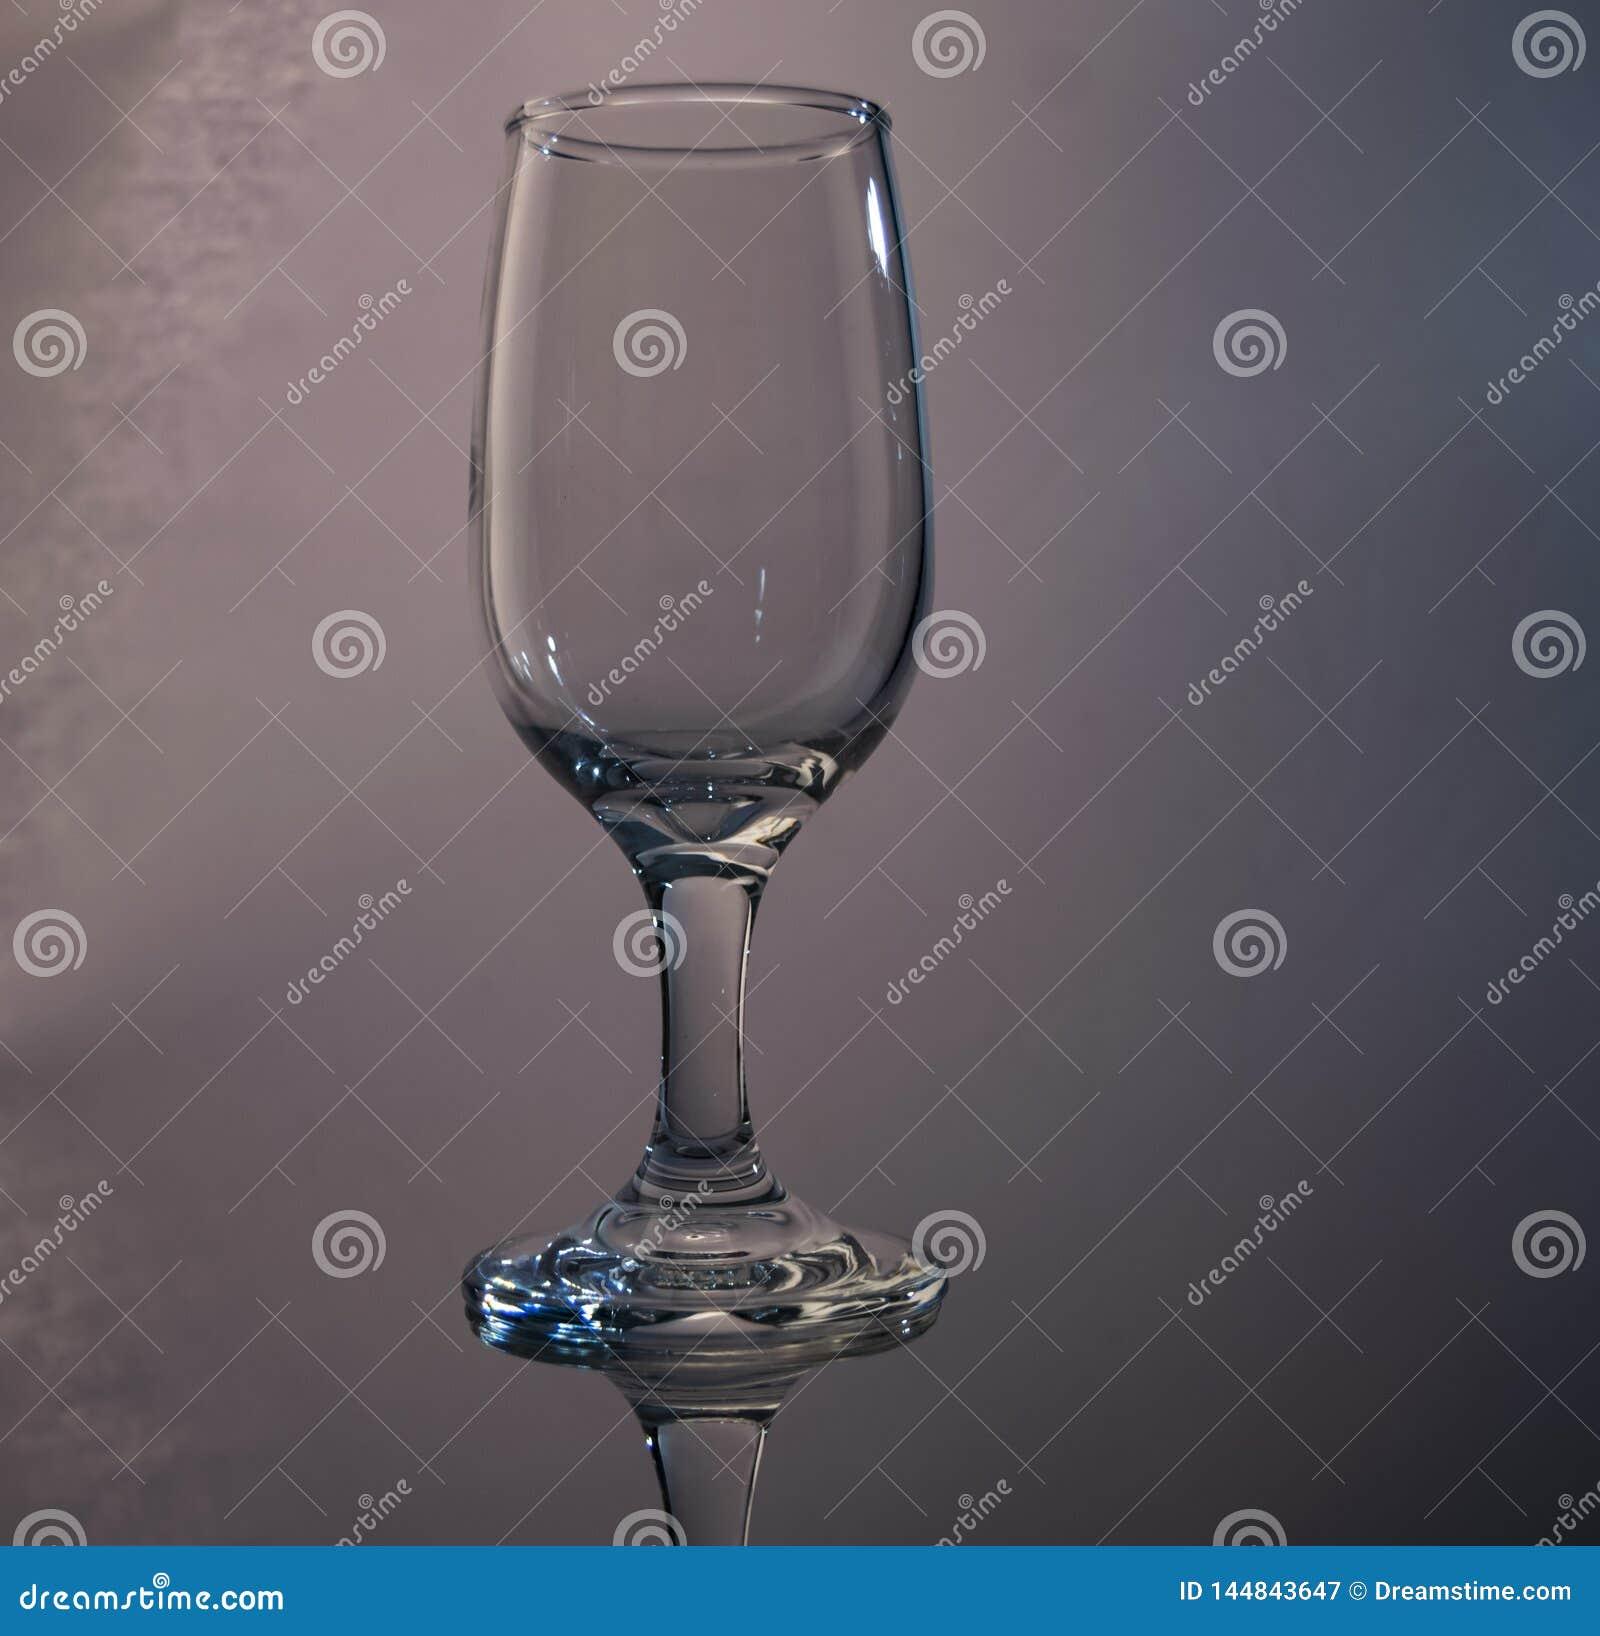 Reflective wine glass